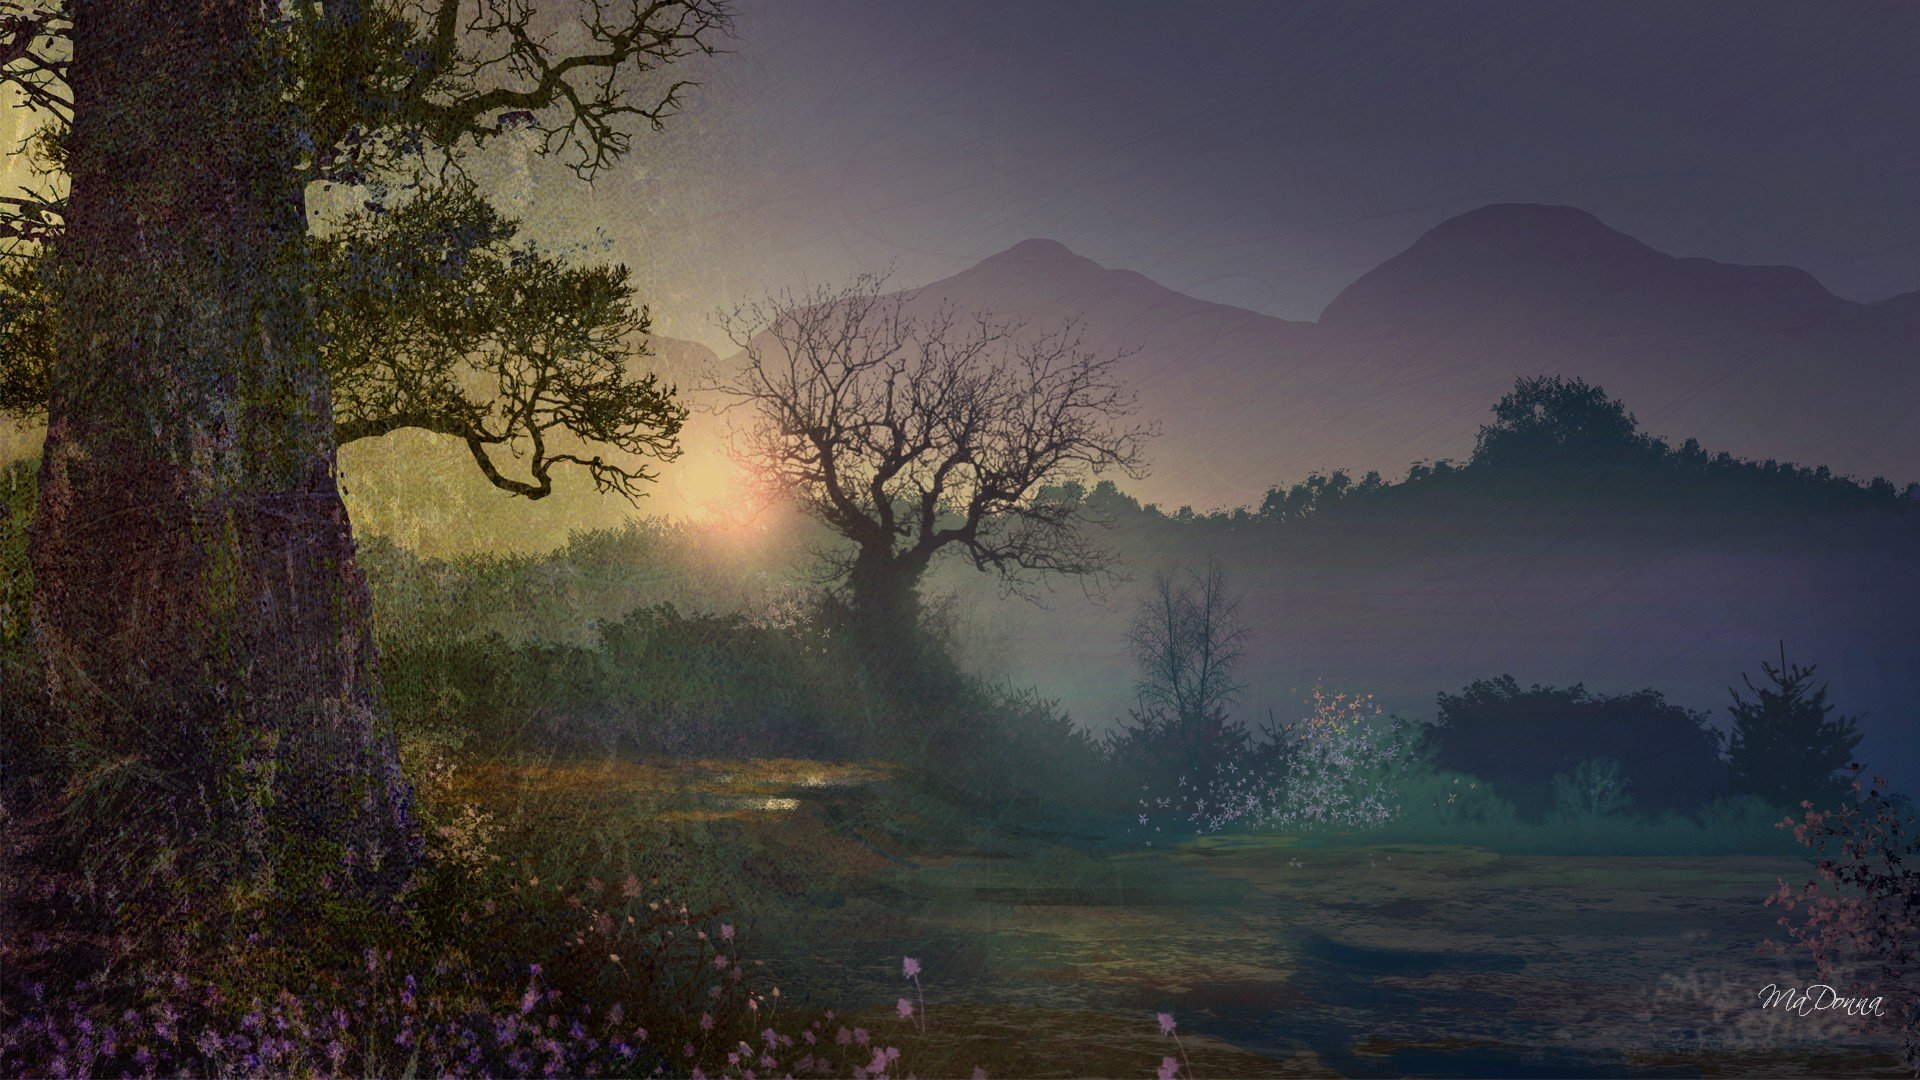 Download Full Hd 1080p Cool Nature Pc Wallpaper Id419945